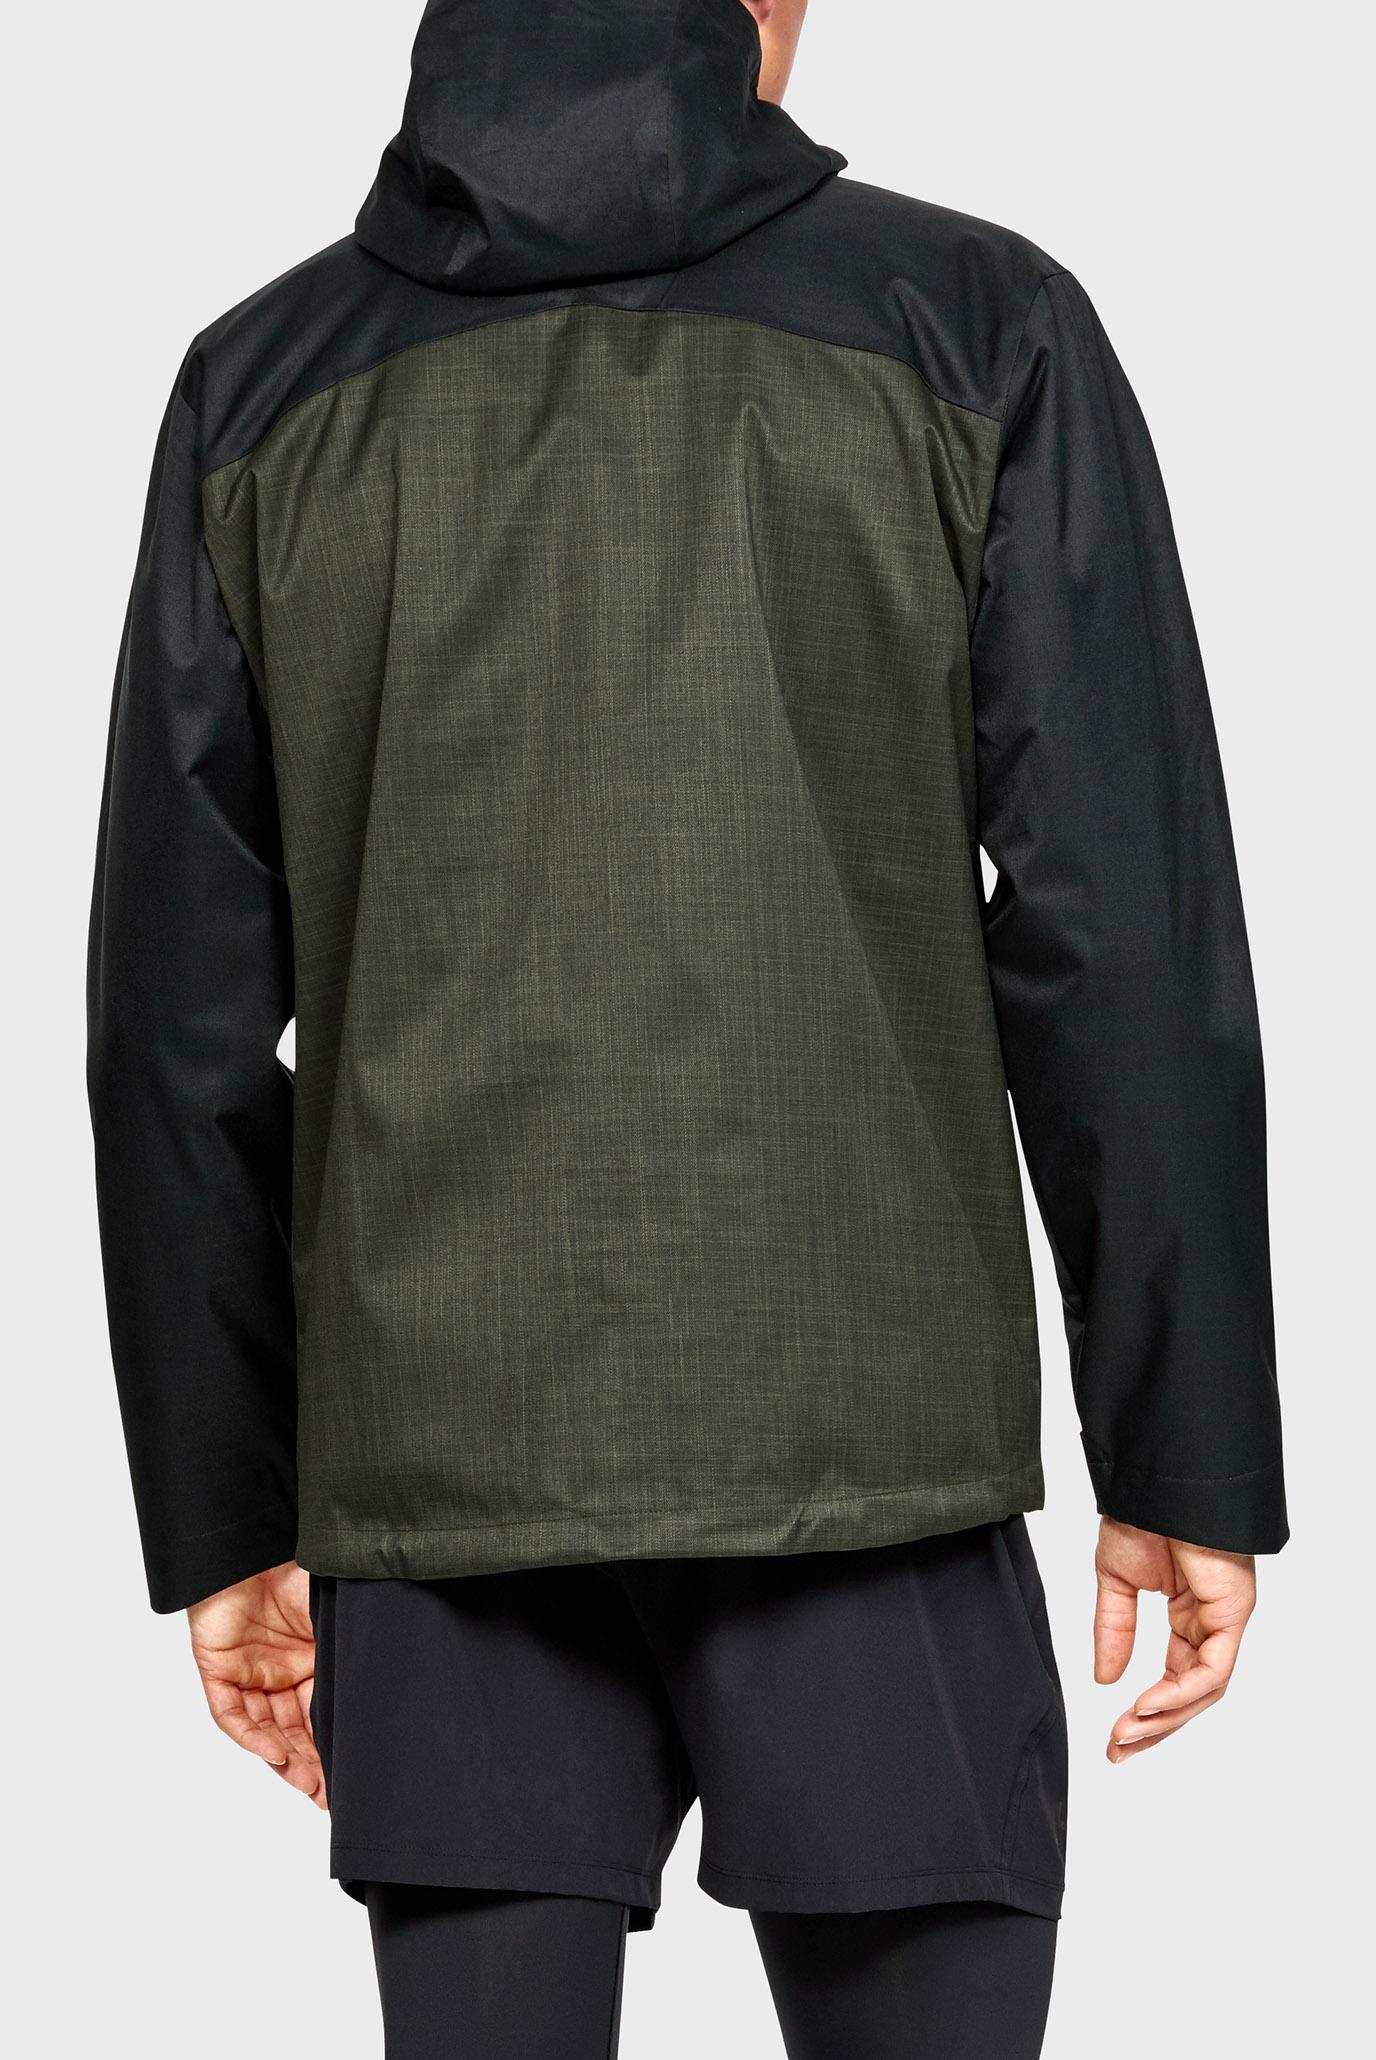 Мужская куртка UA Porter 3-in-1 Jacket Under Armour